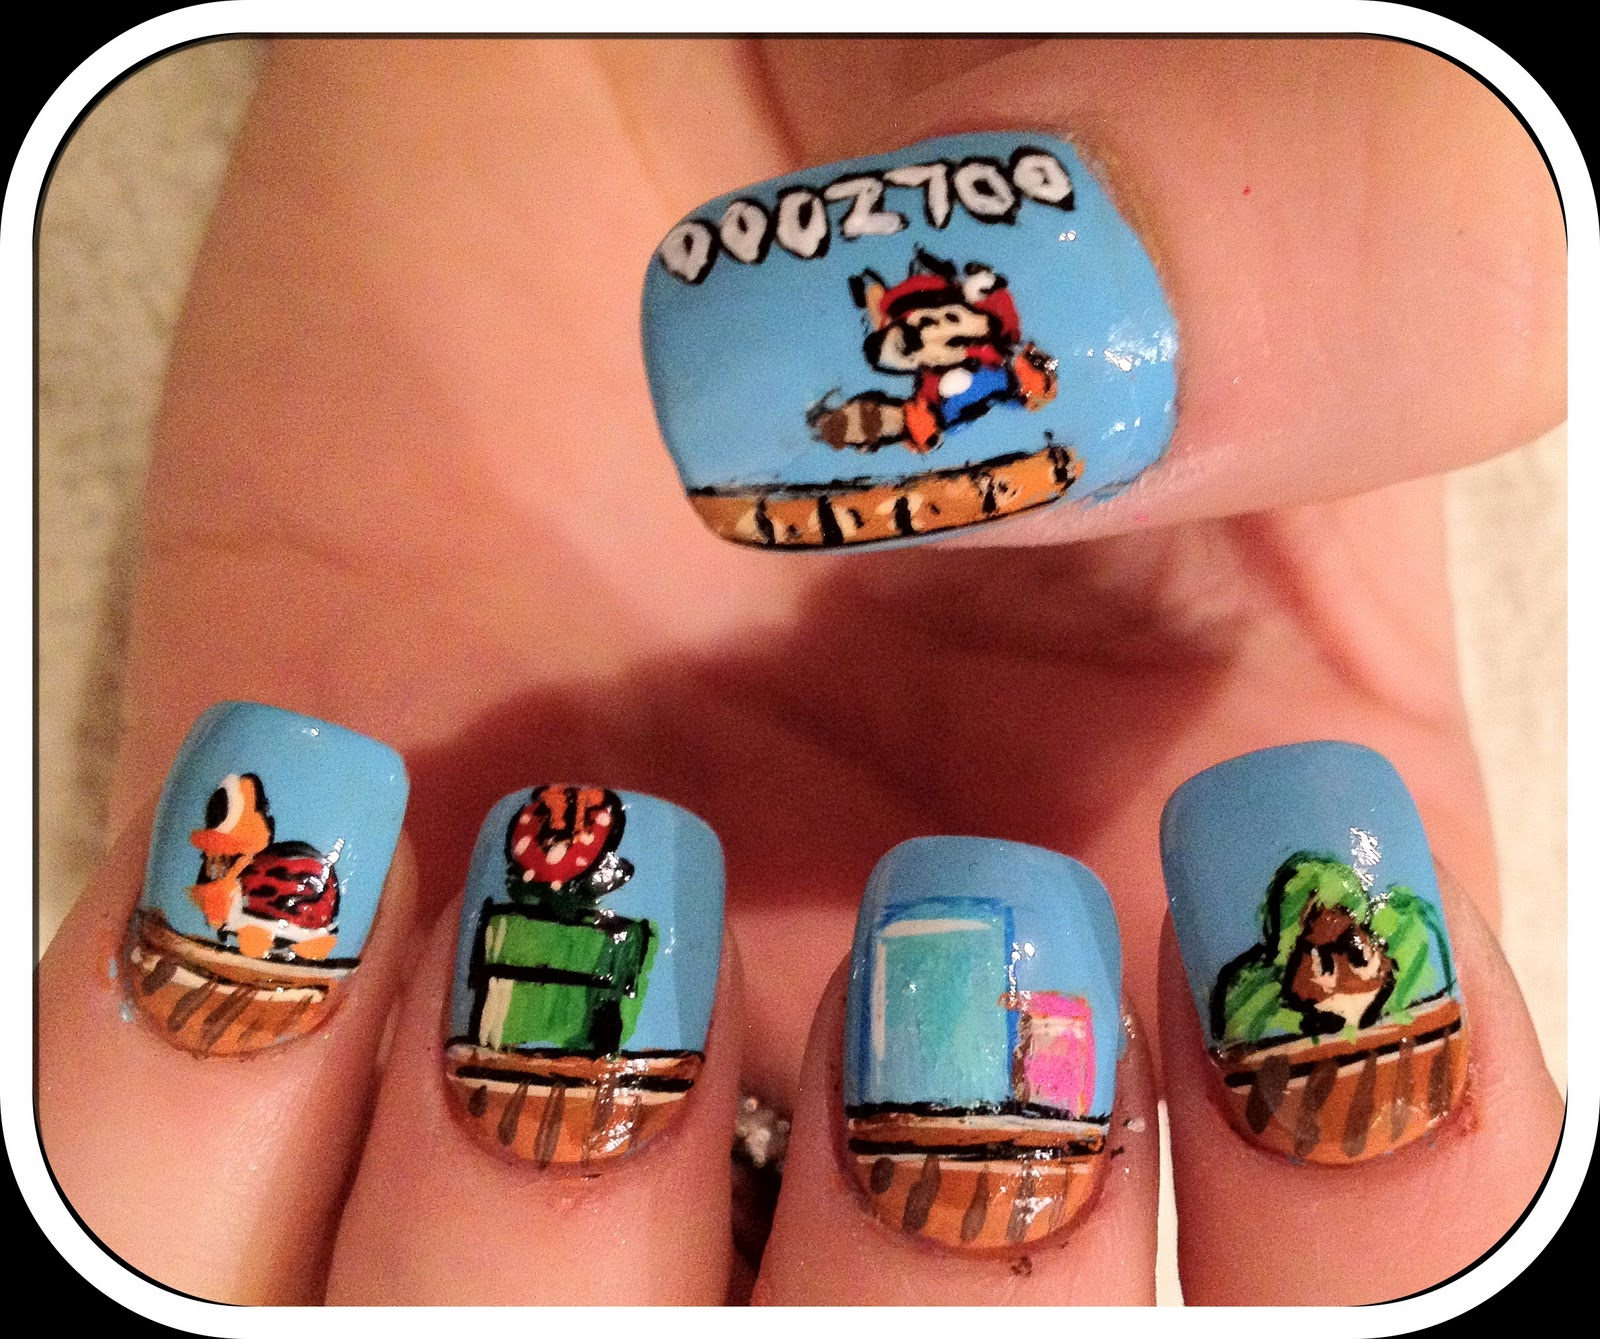 Nailed Daily: Day 57 - Super Mario Bros 3